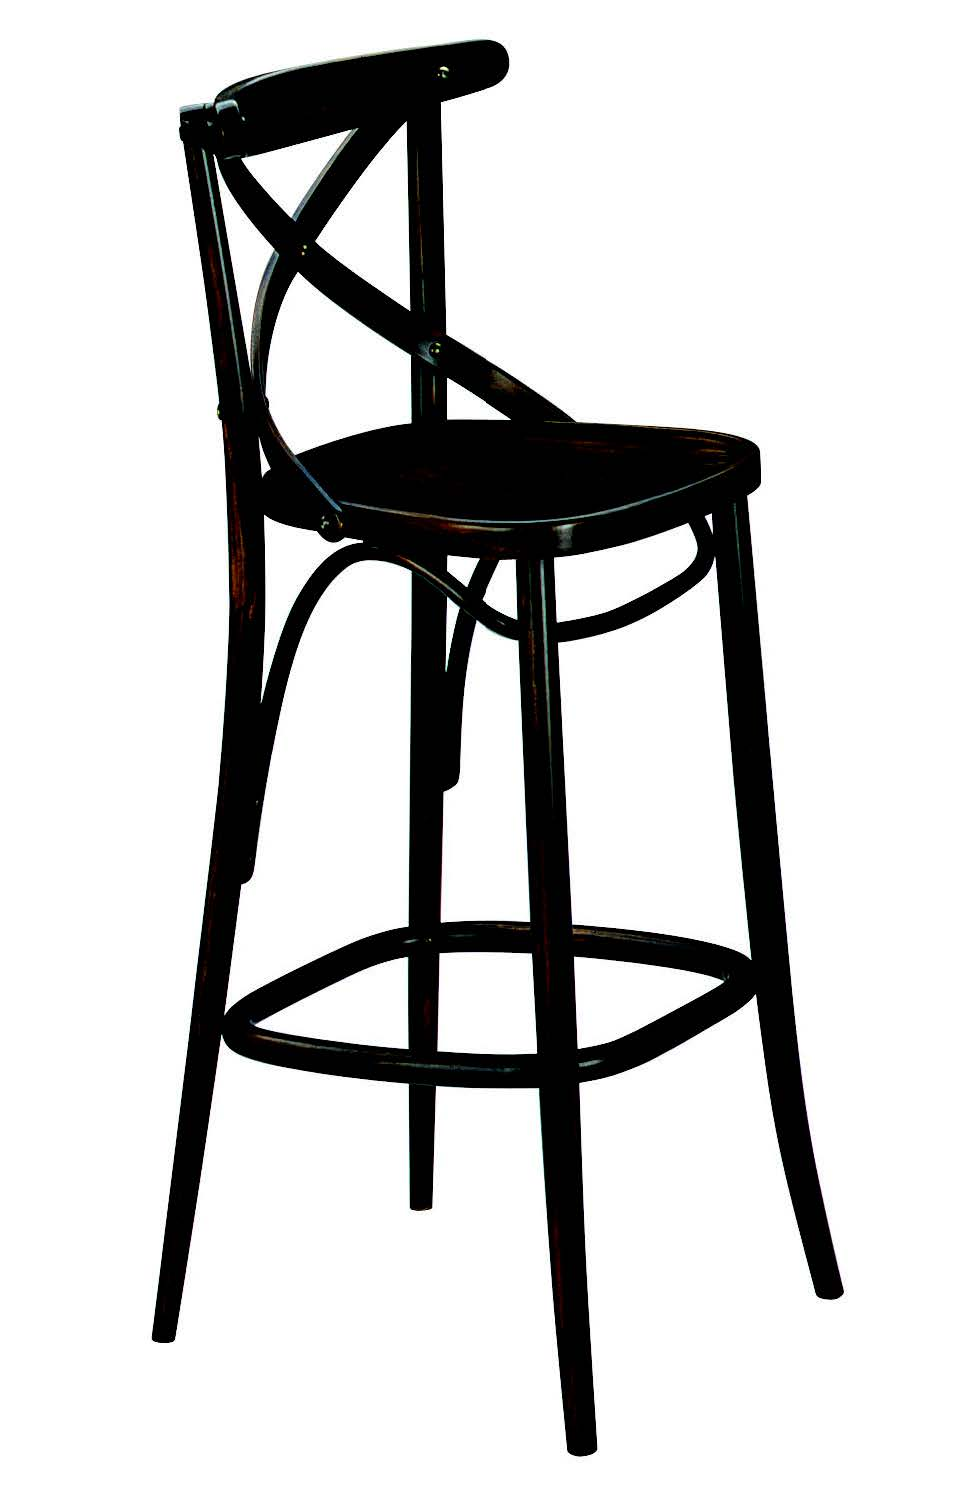 Sgabello croce galimberti sedie e tavoli for Galimberti sedie